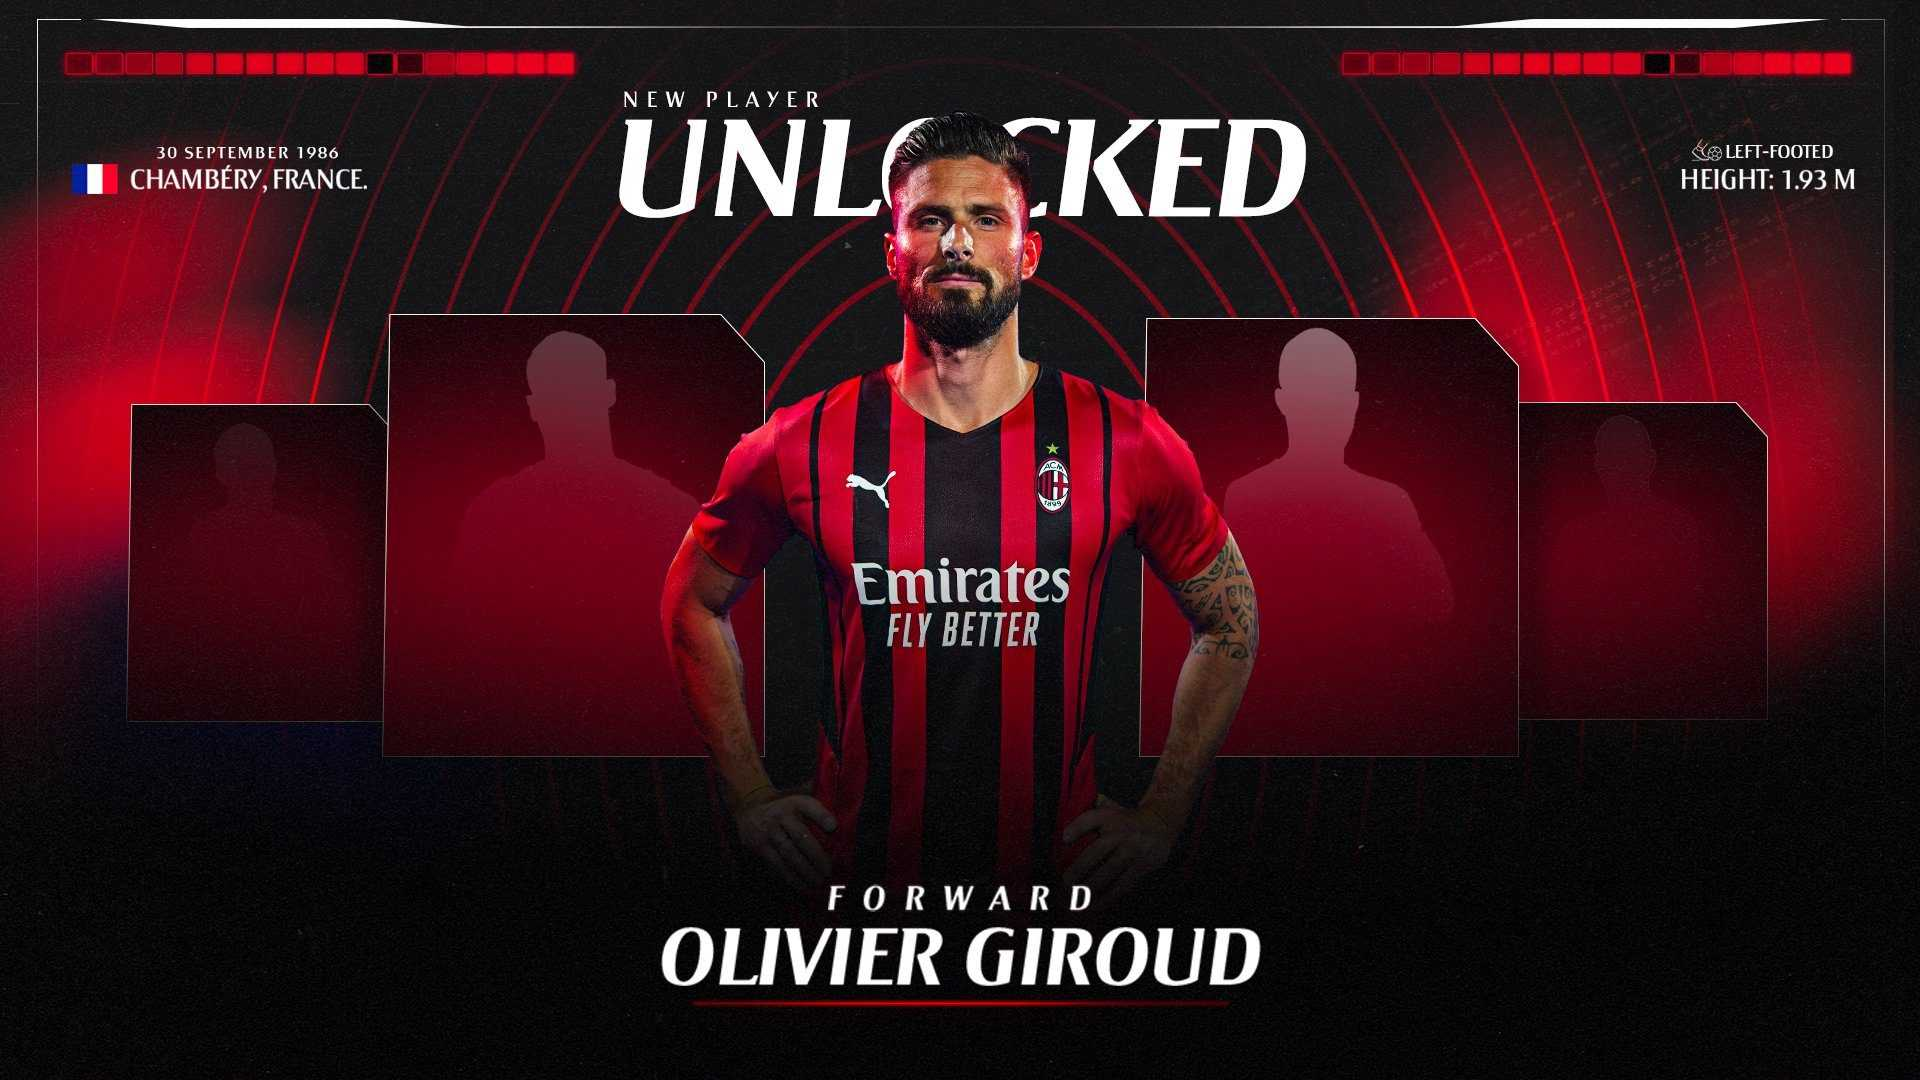 Le pagelle di Milan-Cagliari (4-1): Giroud mattatore